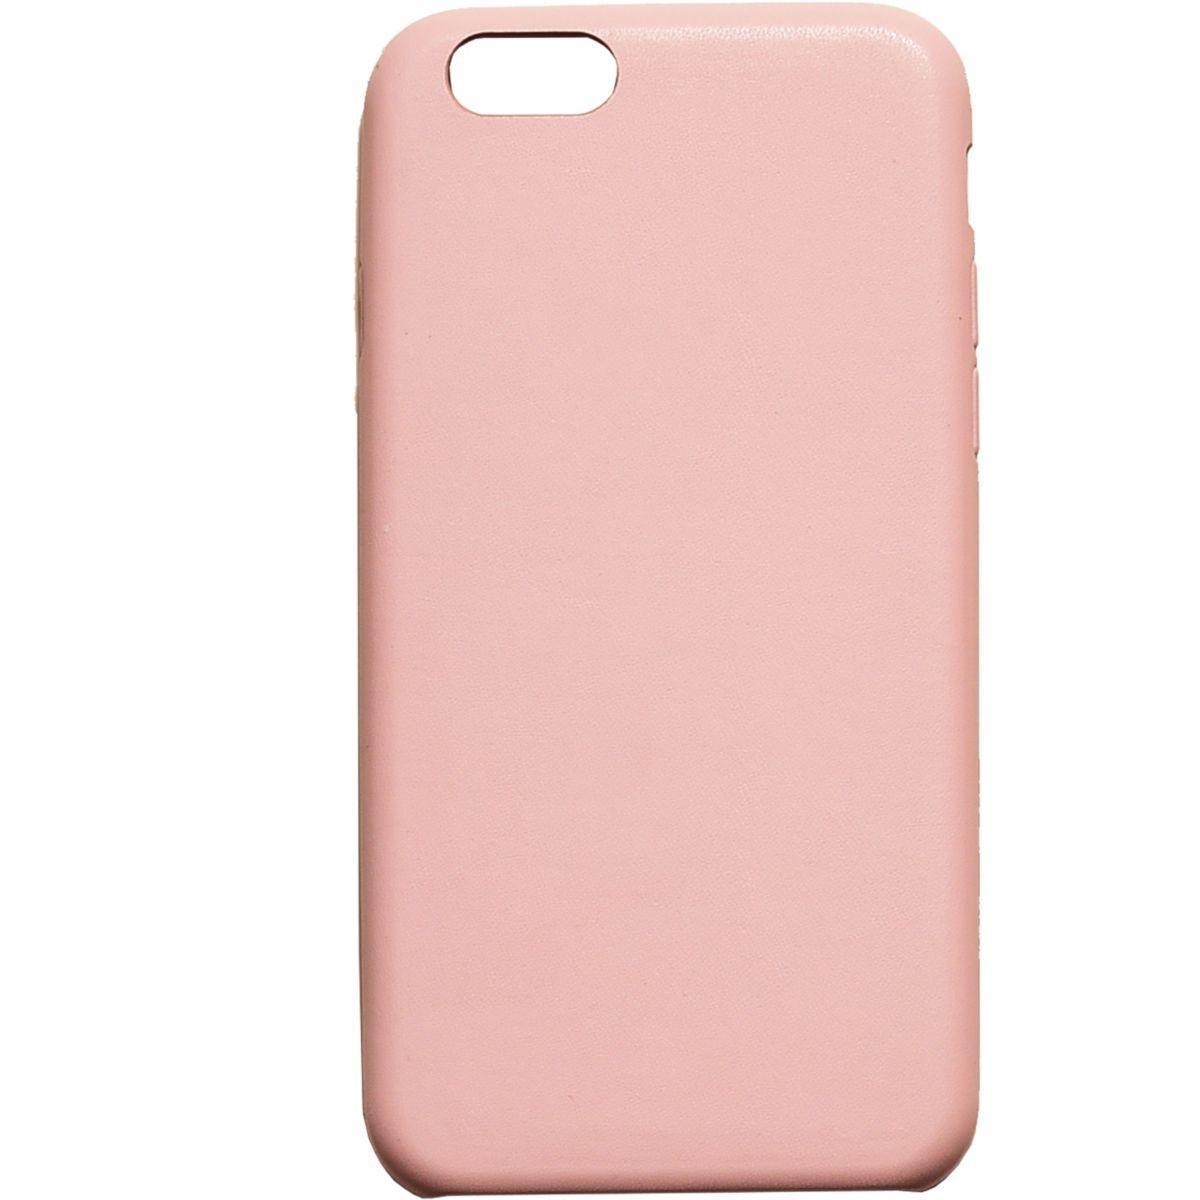 Coque adeqwat iphone 6 plus nude - 20% de remise immédiate avec le code : multi20 (photo)